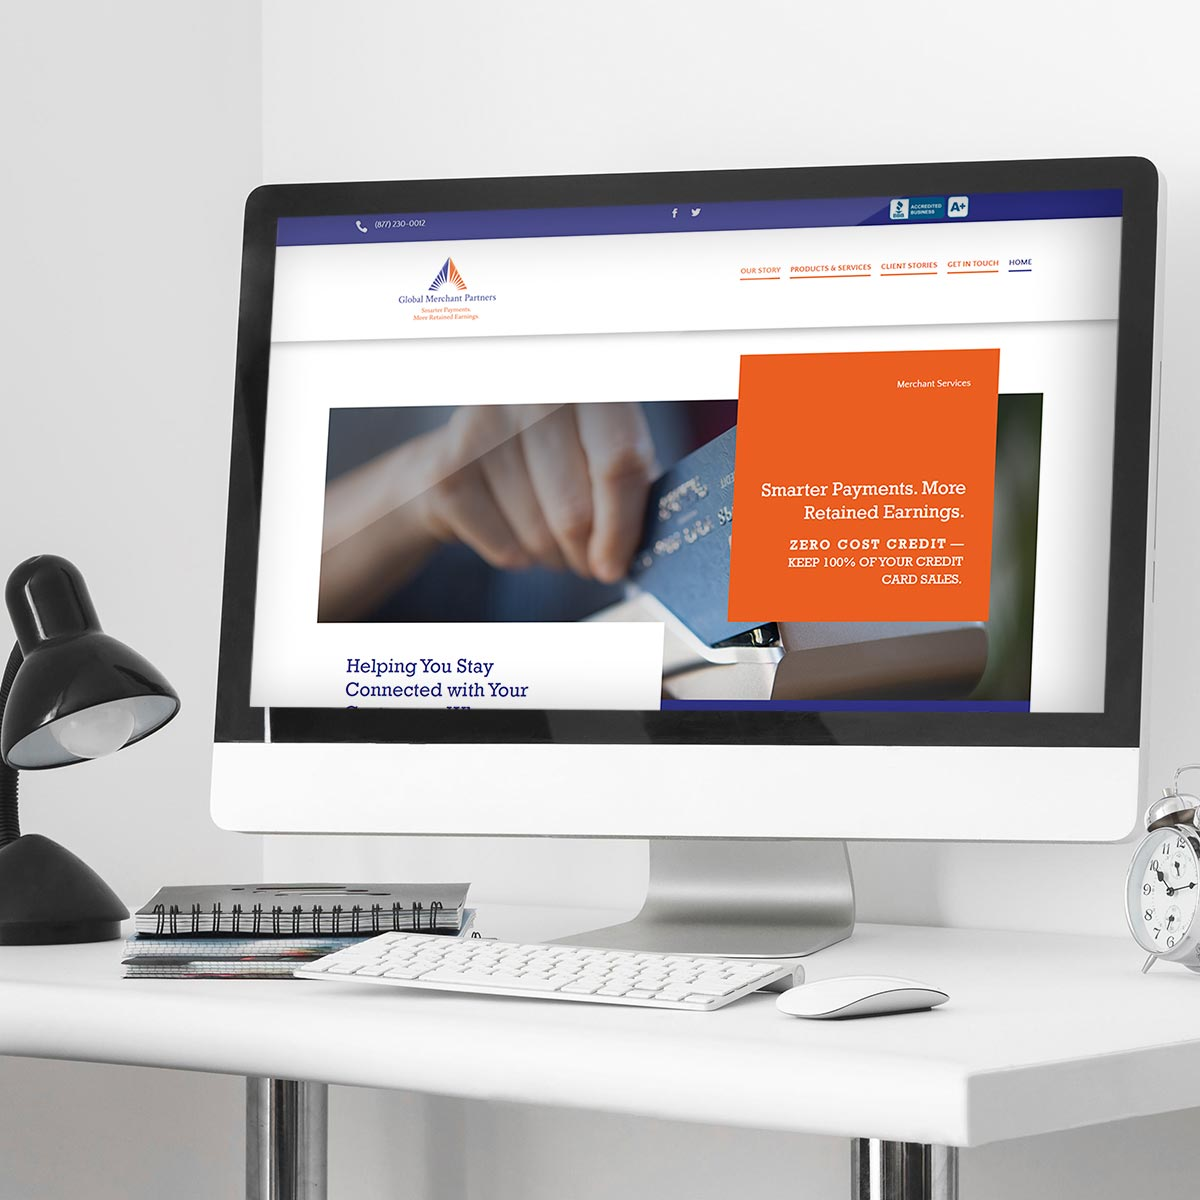 Merchant solutions website design by BrandSwan, a Delaware branding agency